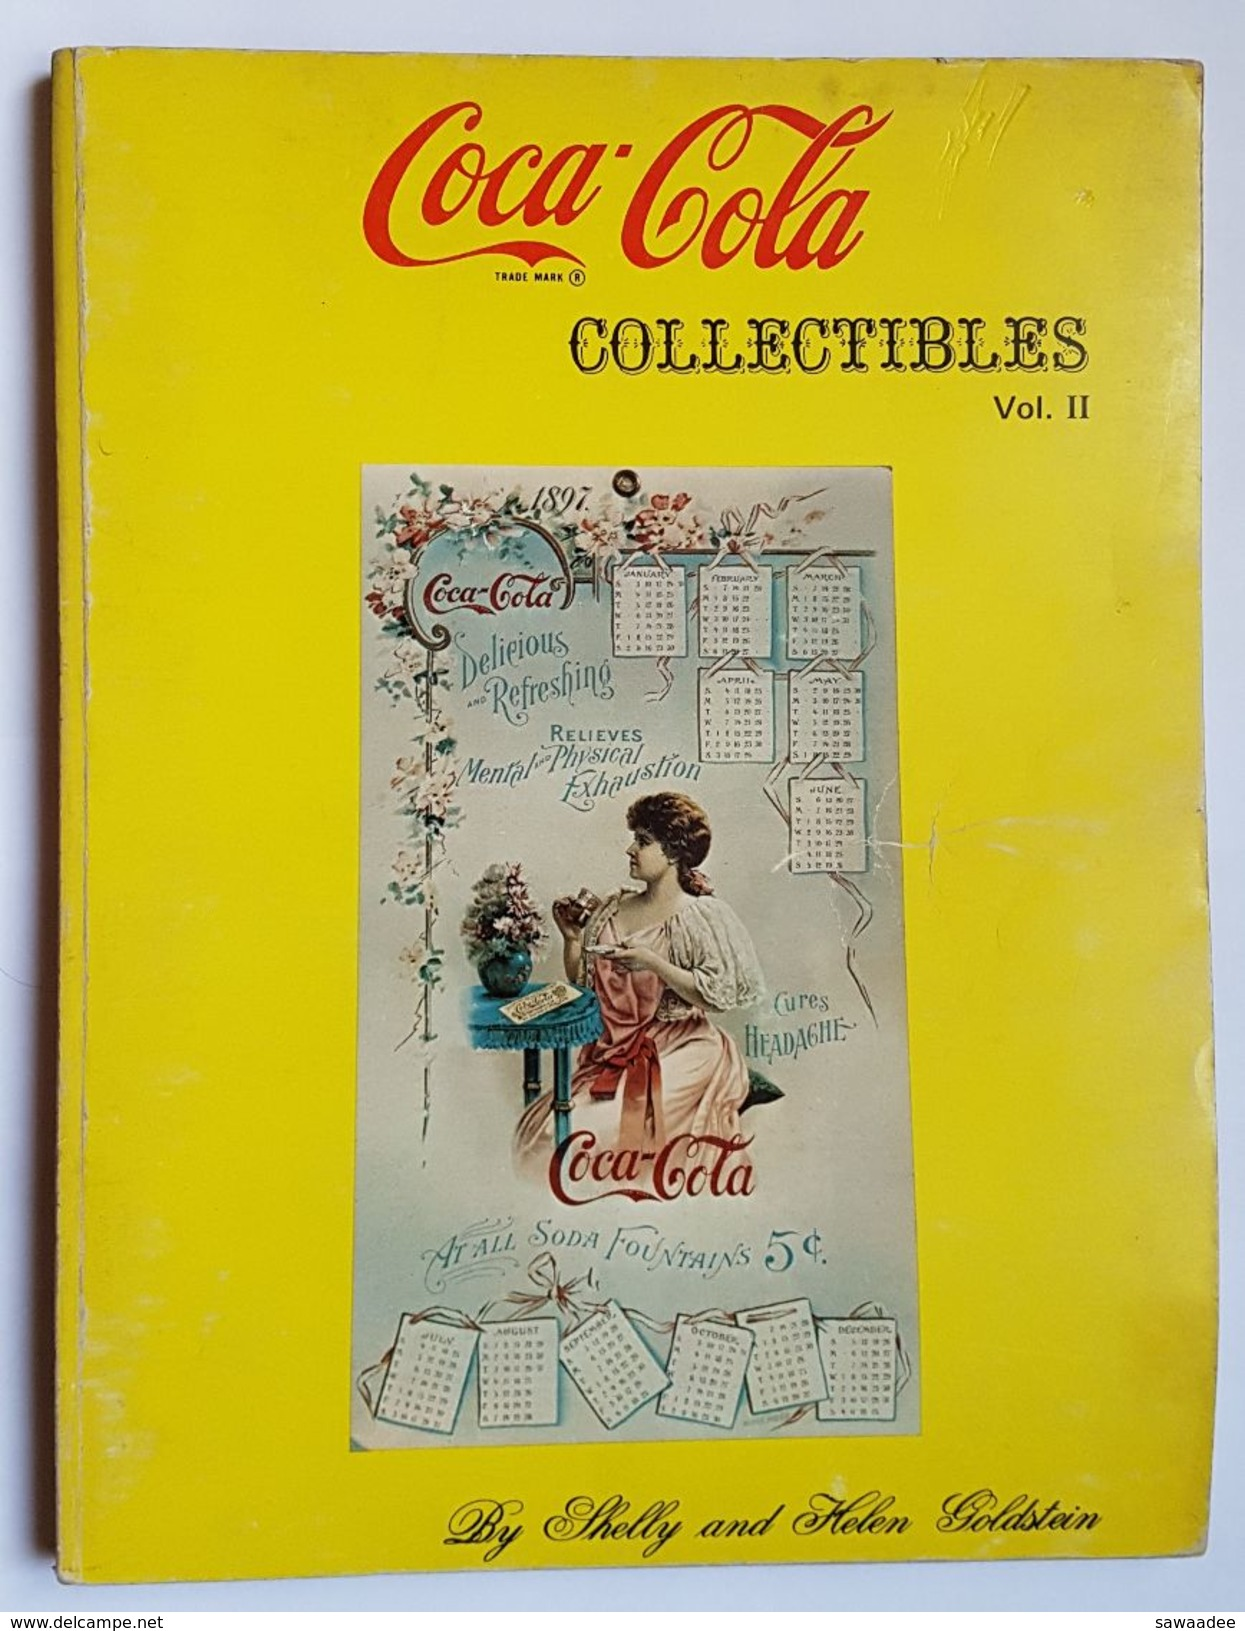 CATALOGUE DE VENTE - U.S.A. - COCA COLA - COLLECTIBLES VOL.II - SHELLY AND HELEN GOLDSTEIN - 1973 - Books